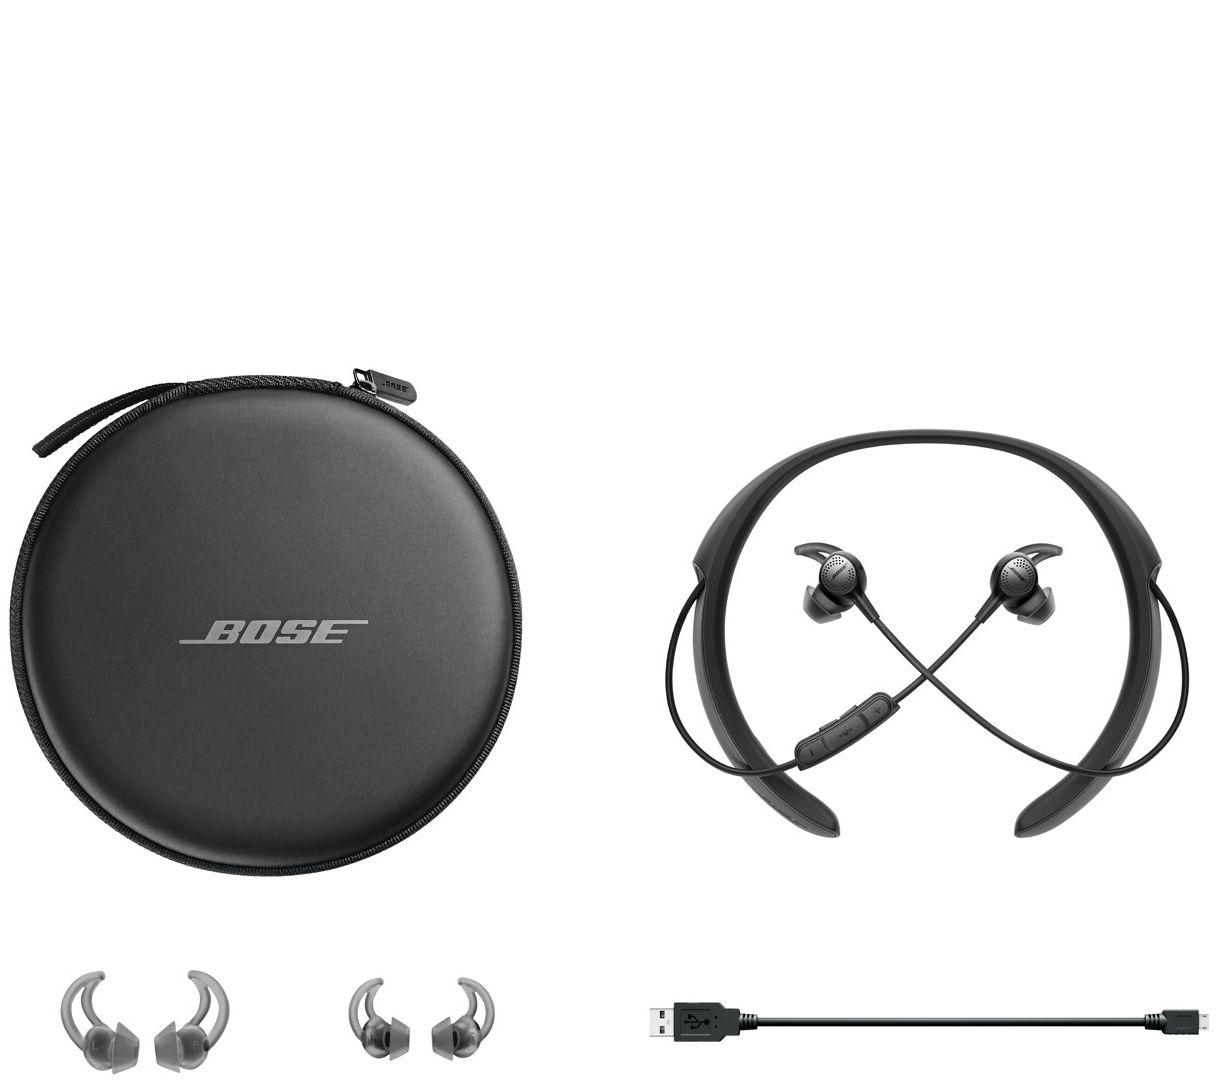 95de12e75c3 Bose QuietControl 30 Wireless Headphones - Page 1 — QVC.com